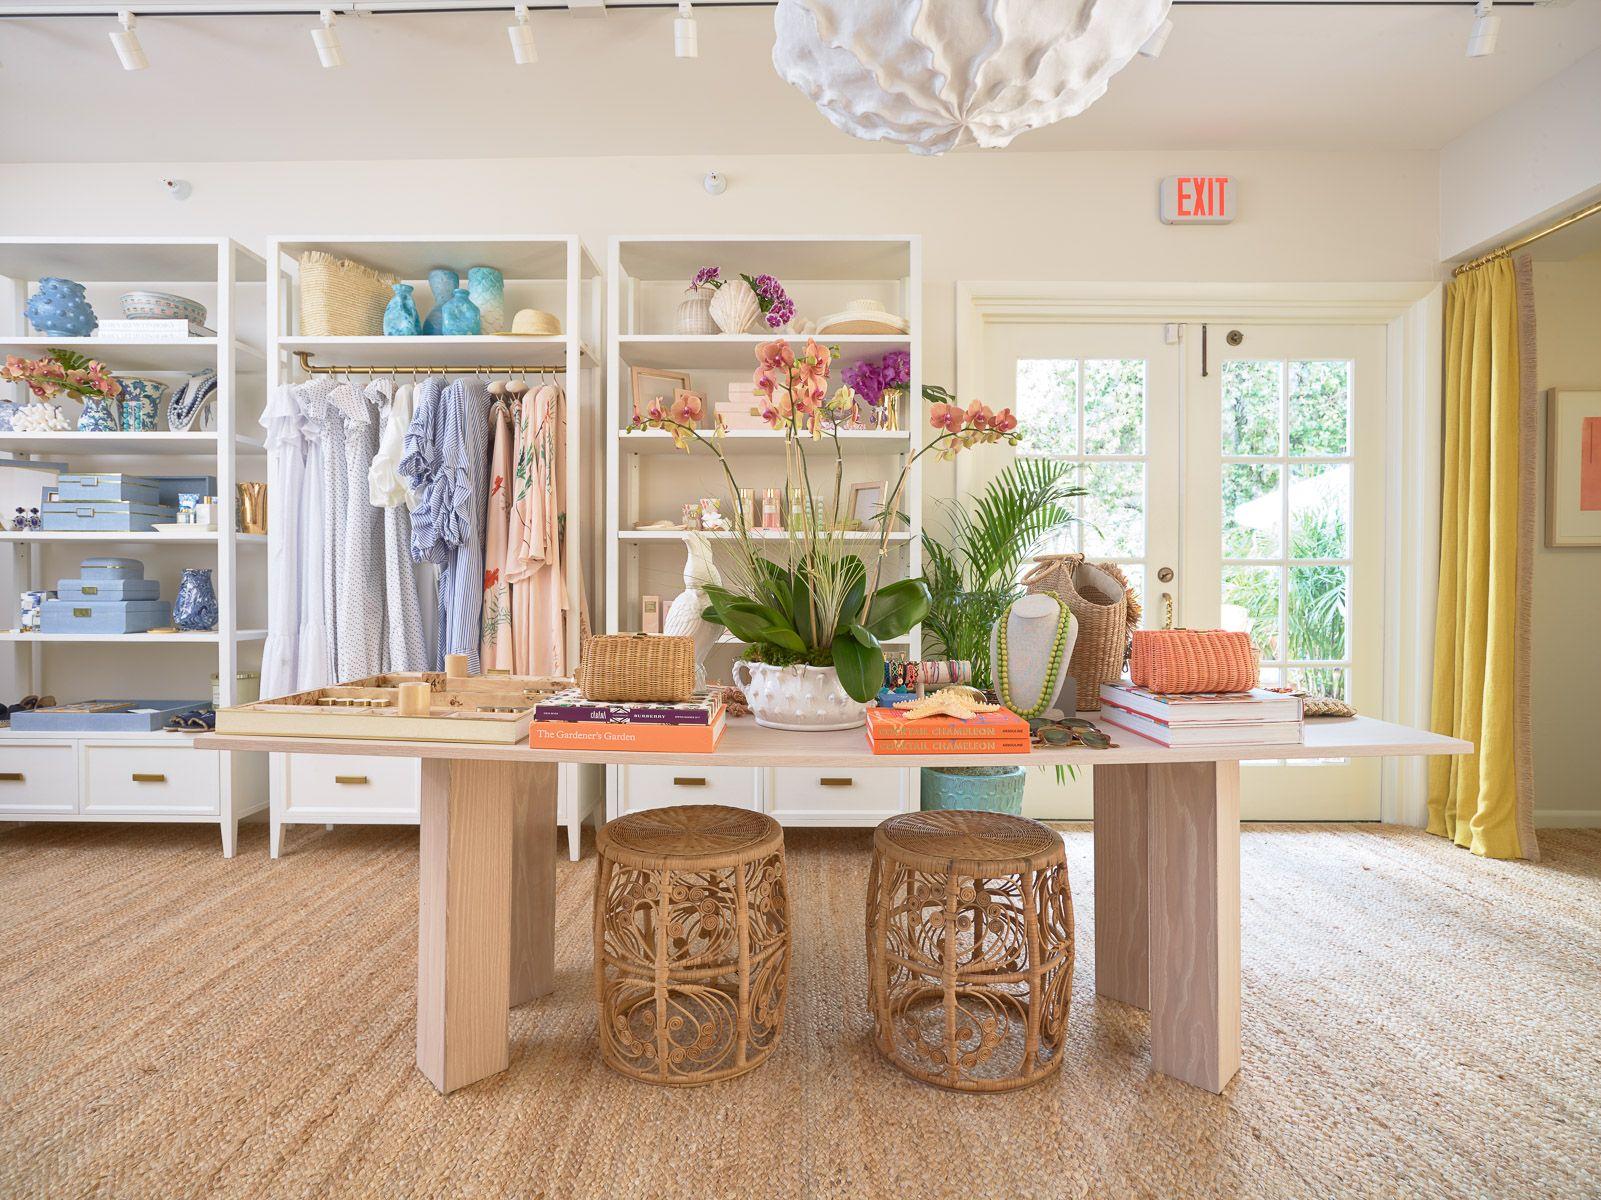 Aerin West Palm Beach Store Lund Beach Stores Palm Beach